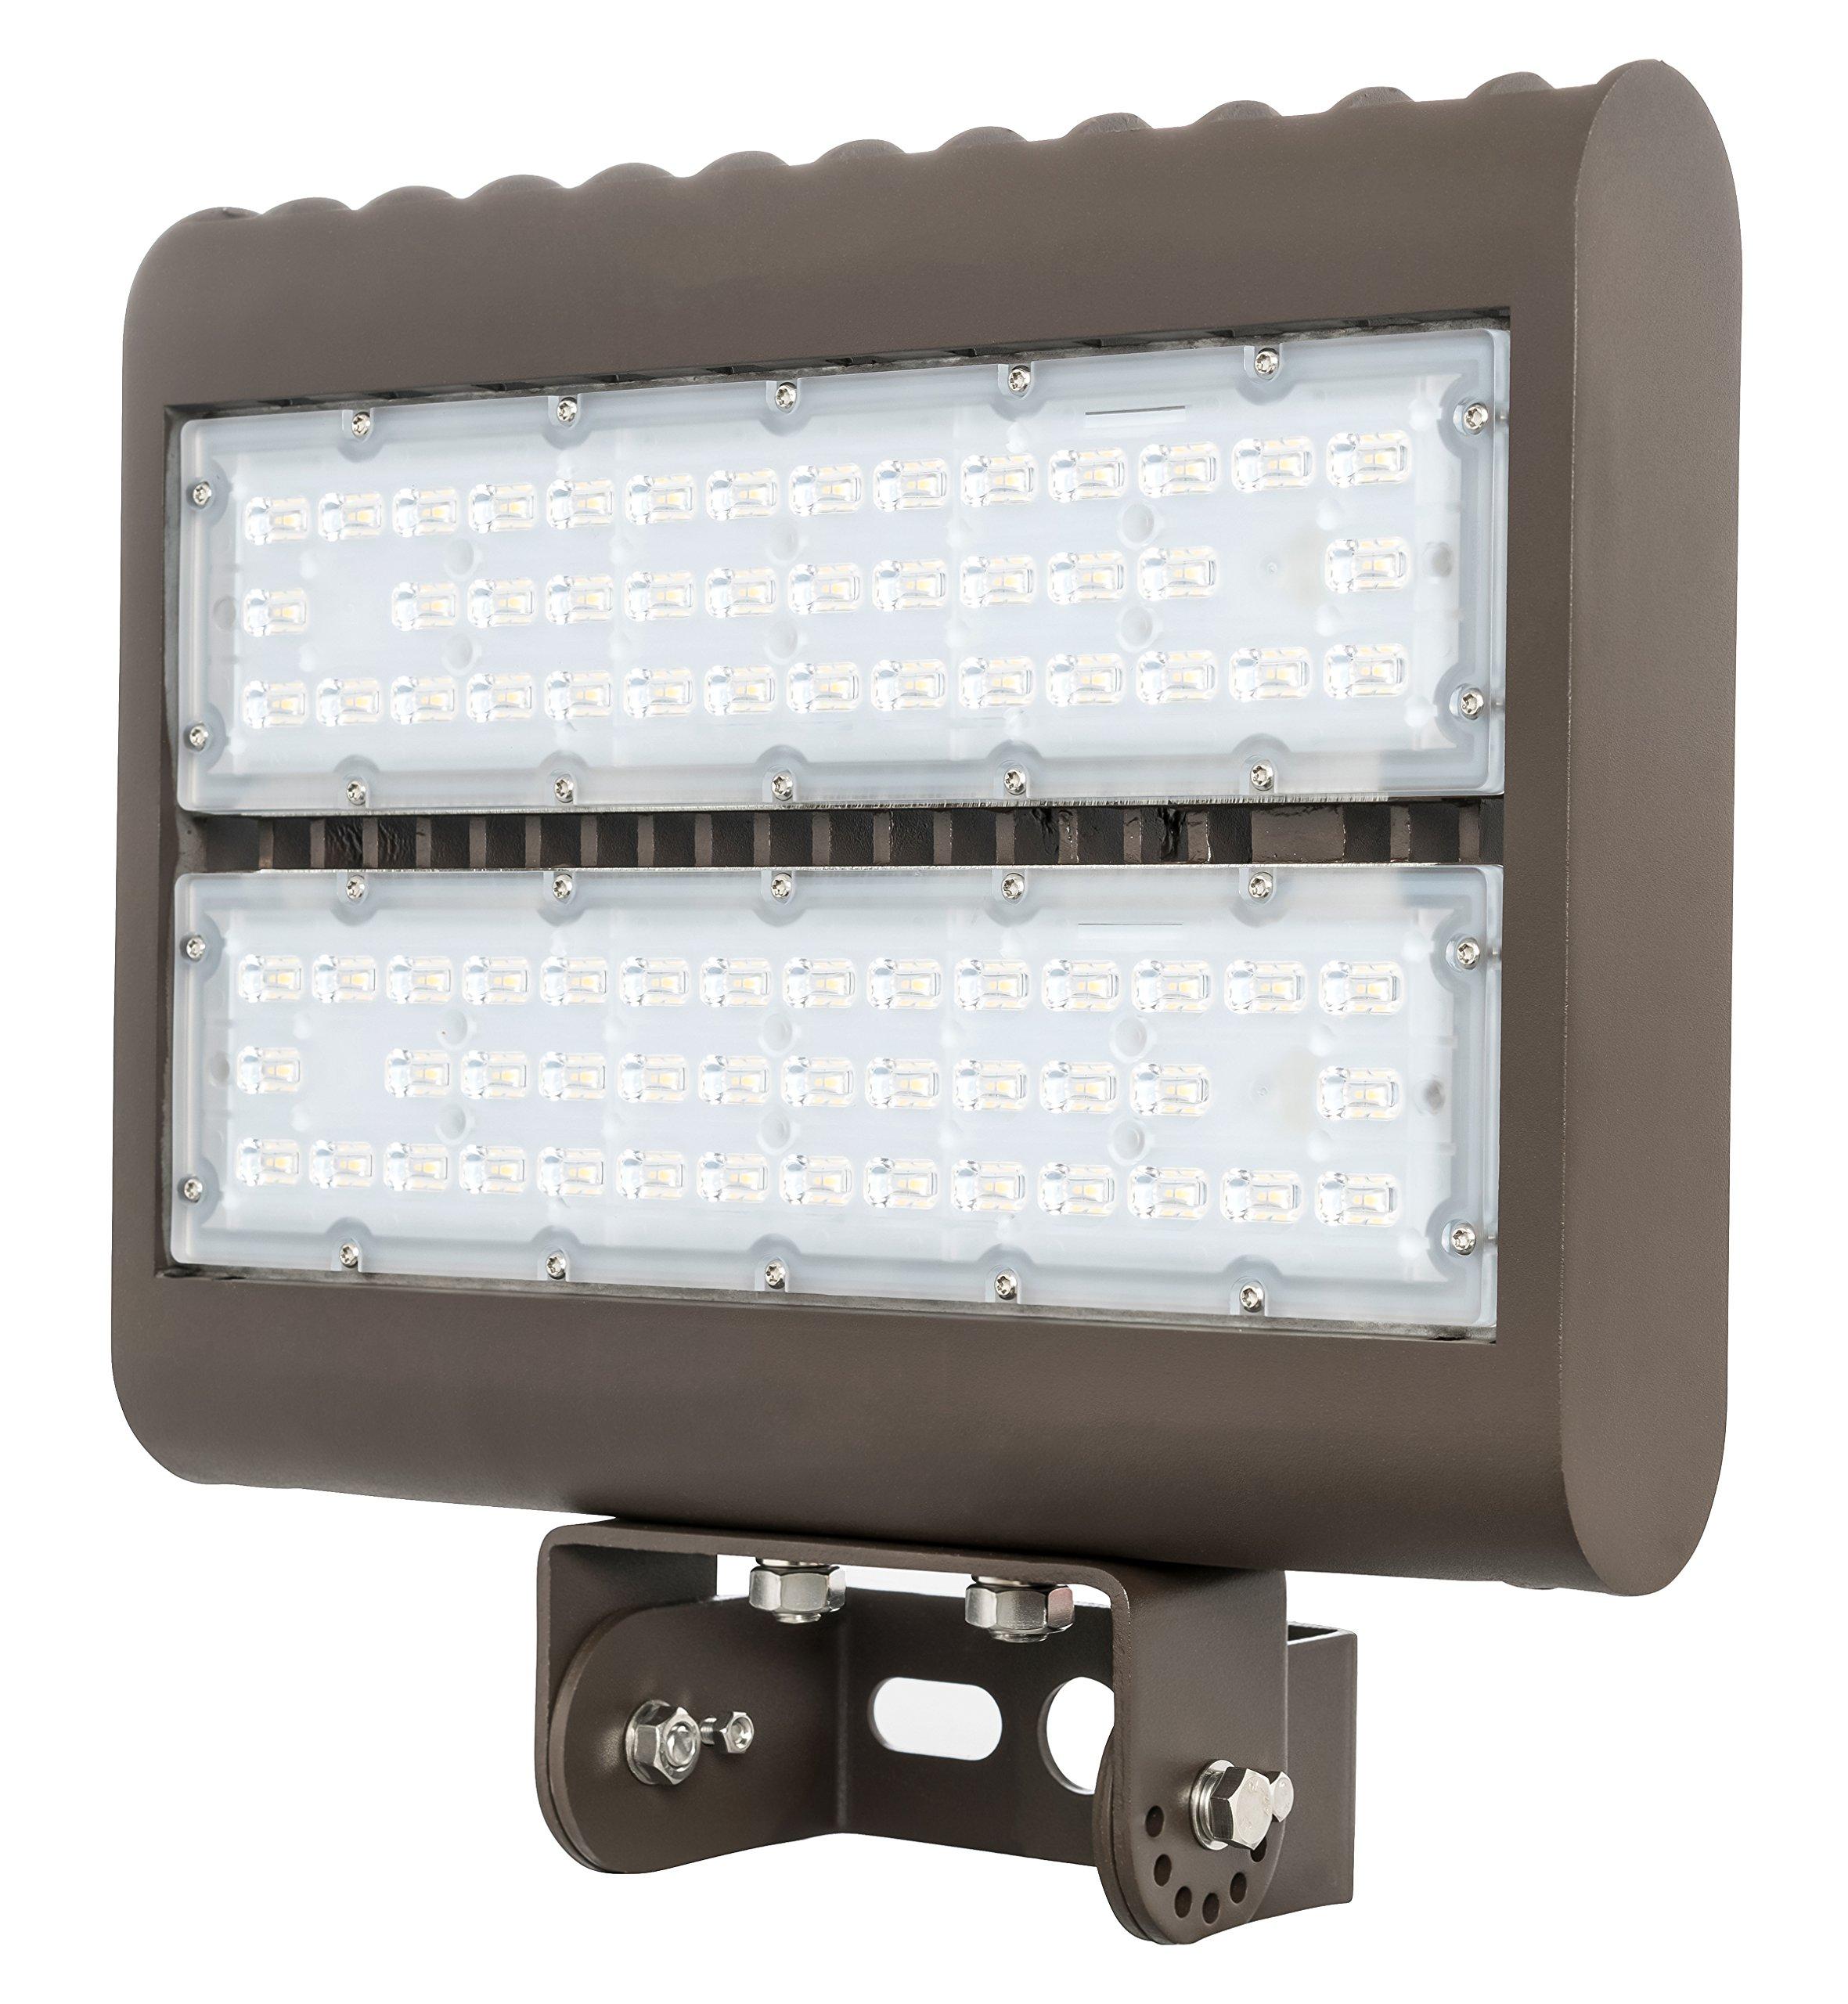 Westgate Outdoor LED Flood Light Fixture with Yoke Mount - Shoebox Parking Lot, Street, Area Lights - 120-277V - IP65 DLC Approved (80 Watt 3000K Warm White)